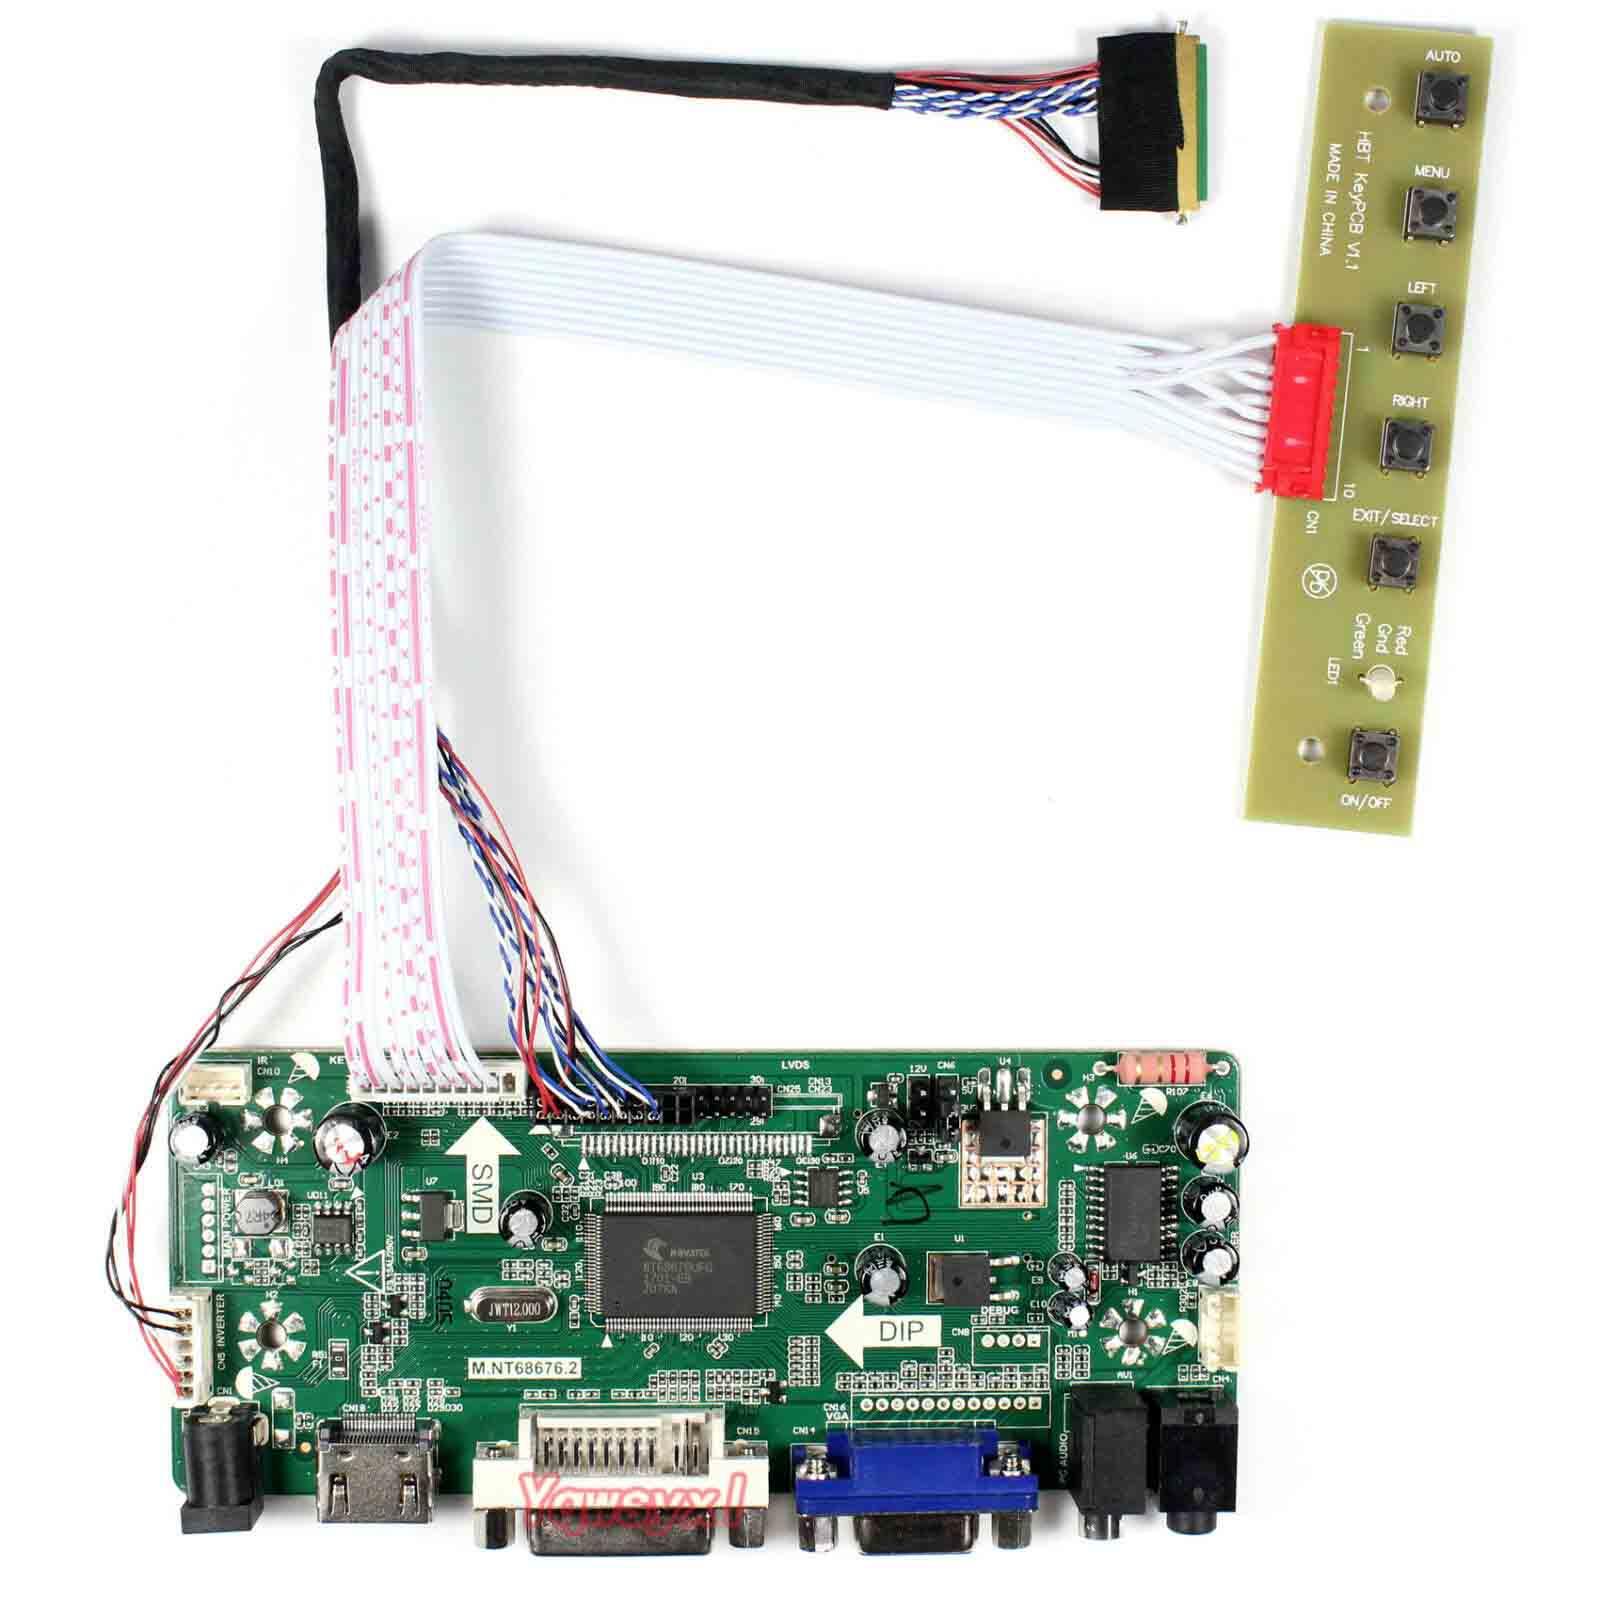 Yqwsyxl Kit de Monitor de tablero de Control para B140XW03 V0 V.0 HDMI + DVI + VGA LCD controlador de pantalla LED